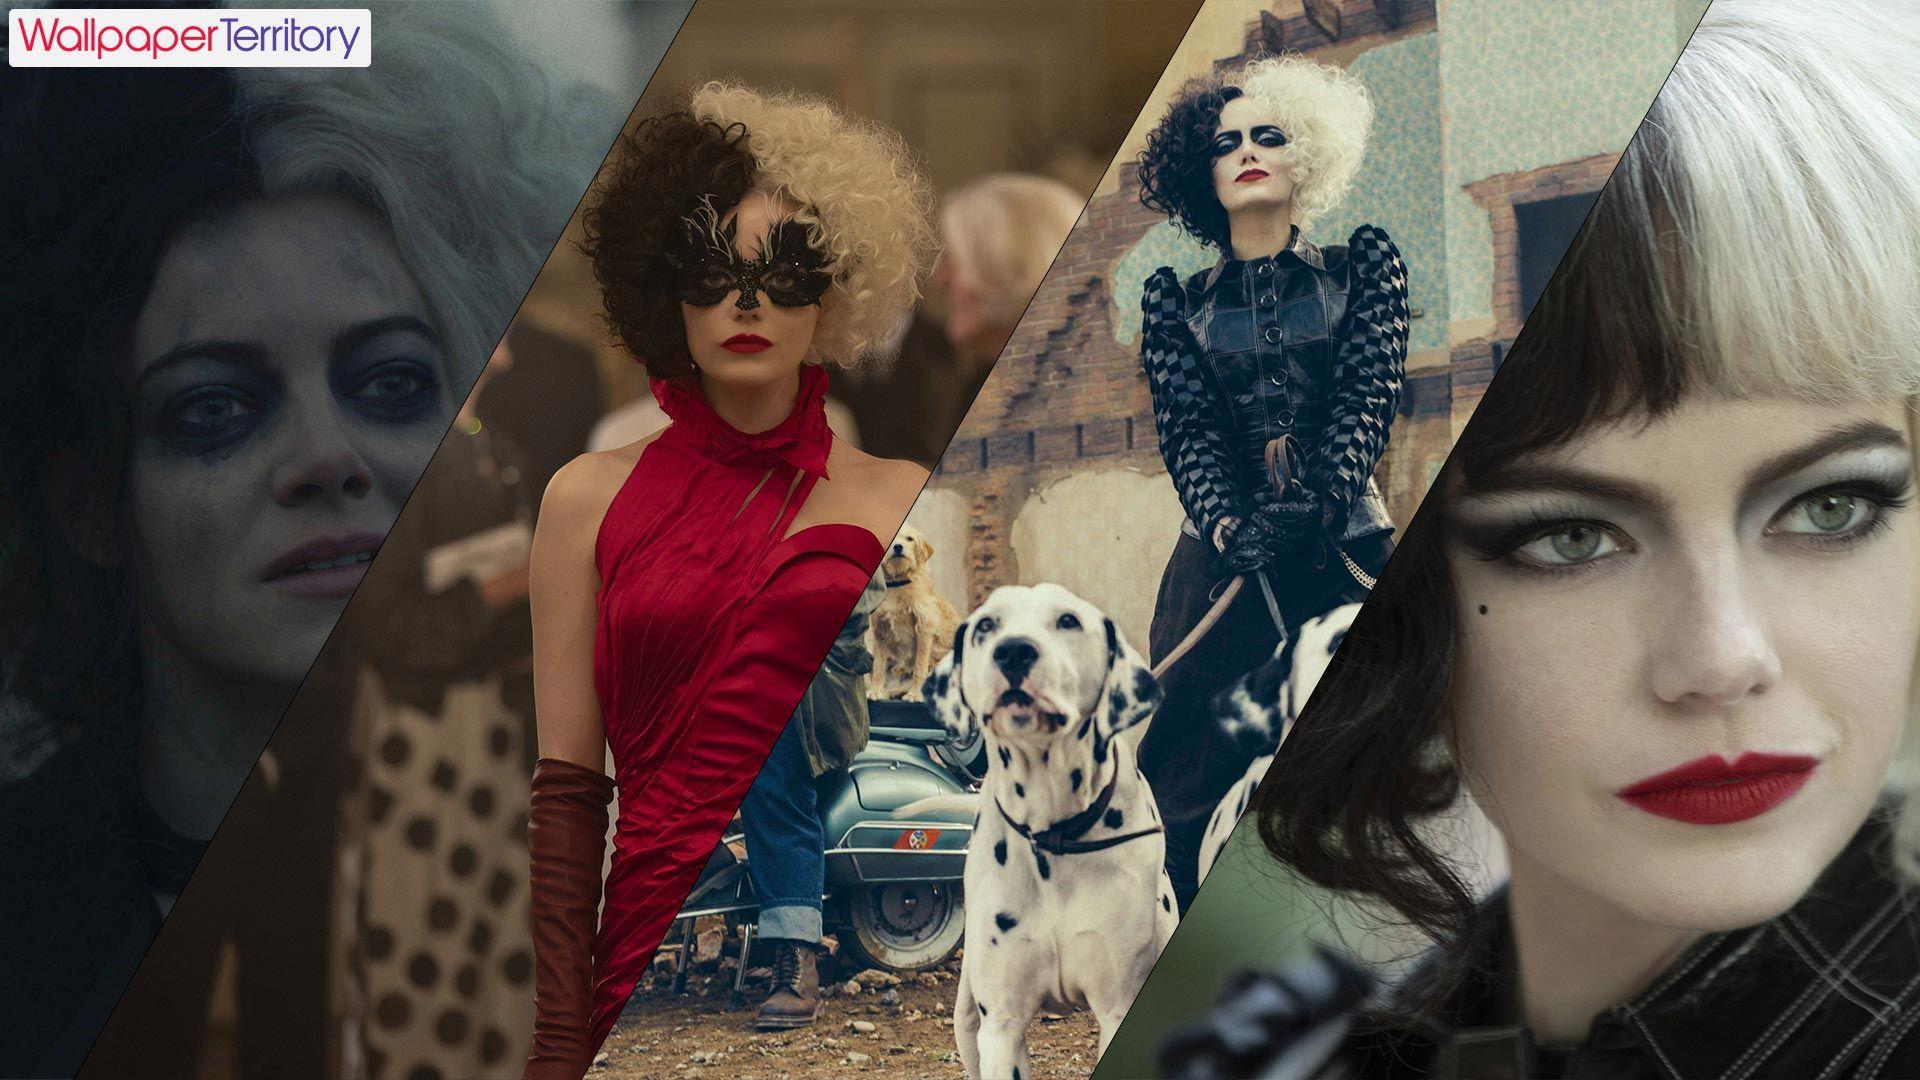 Cruella 2021 Movie Wallpapers HD to 4K - Wallpaper Territory